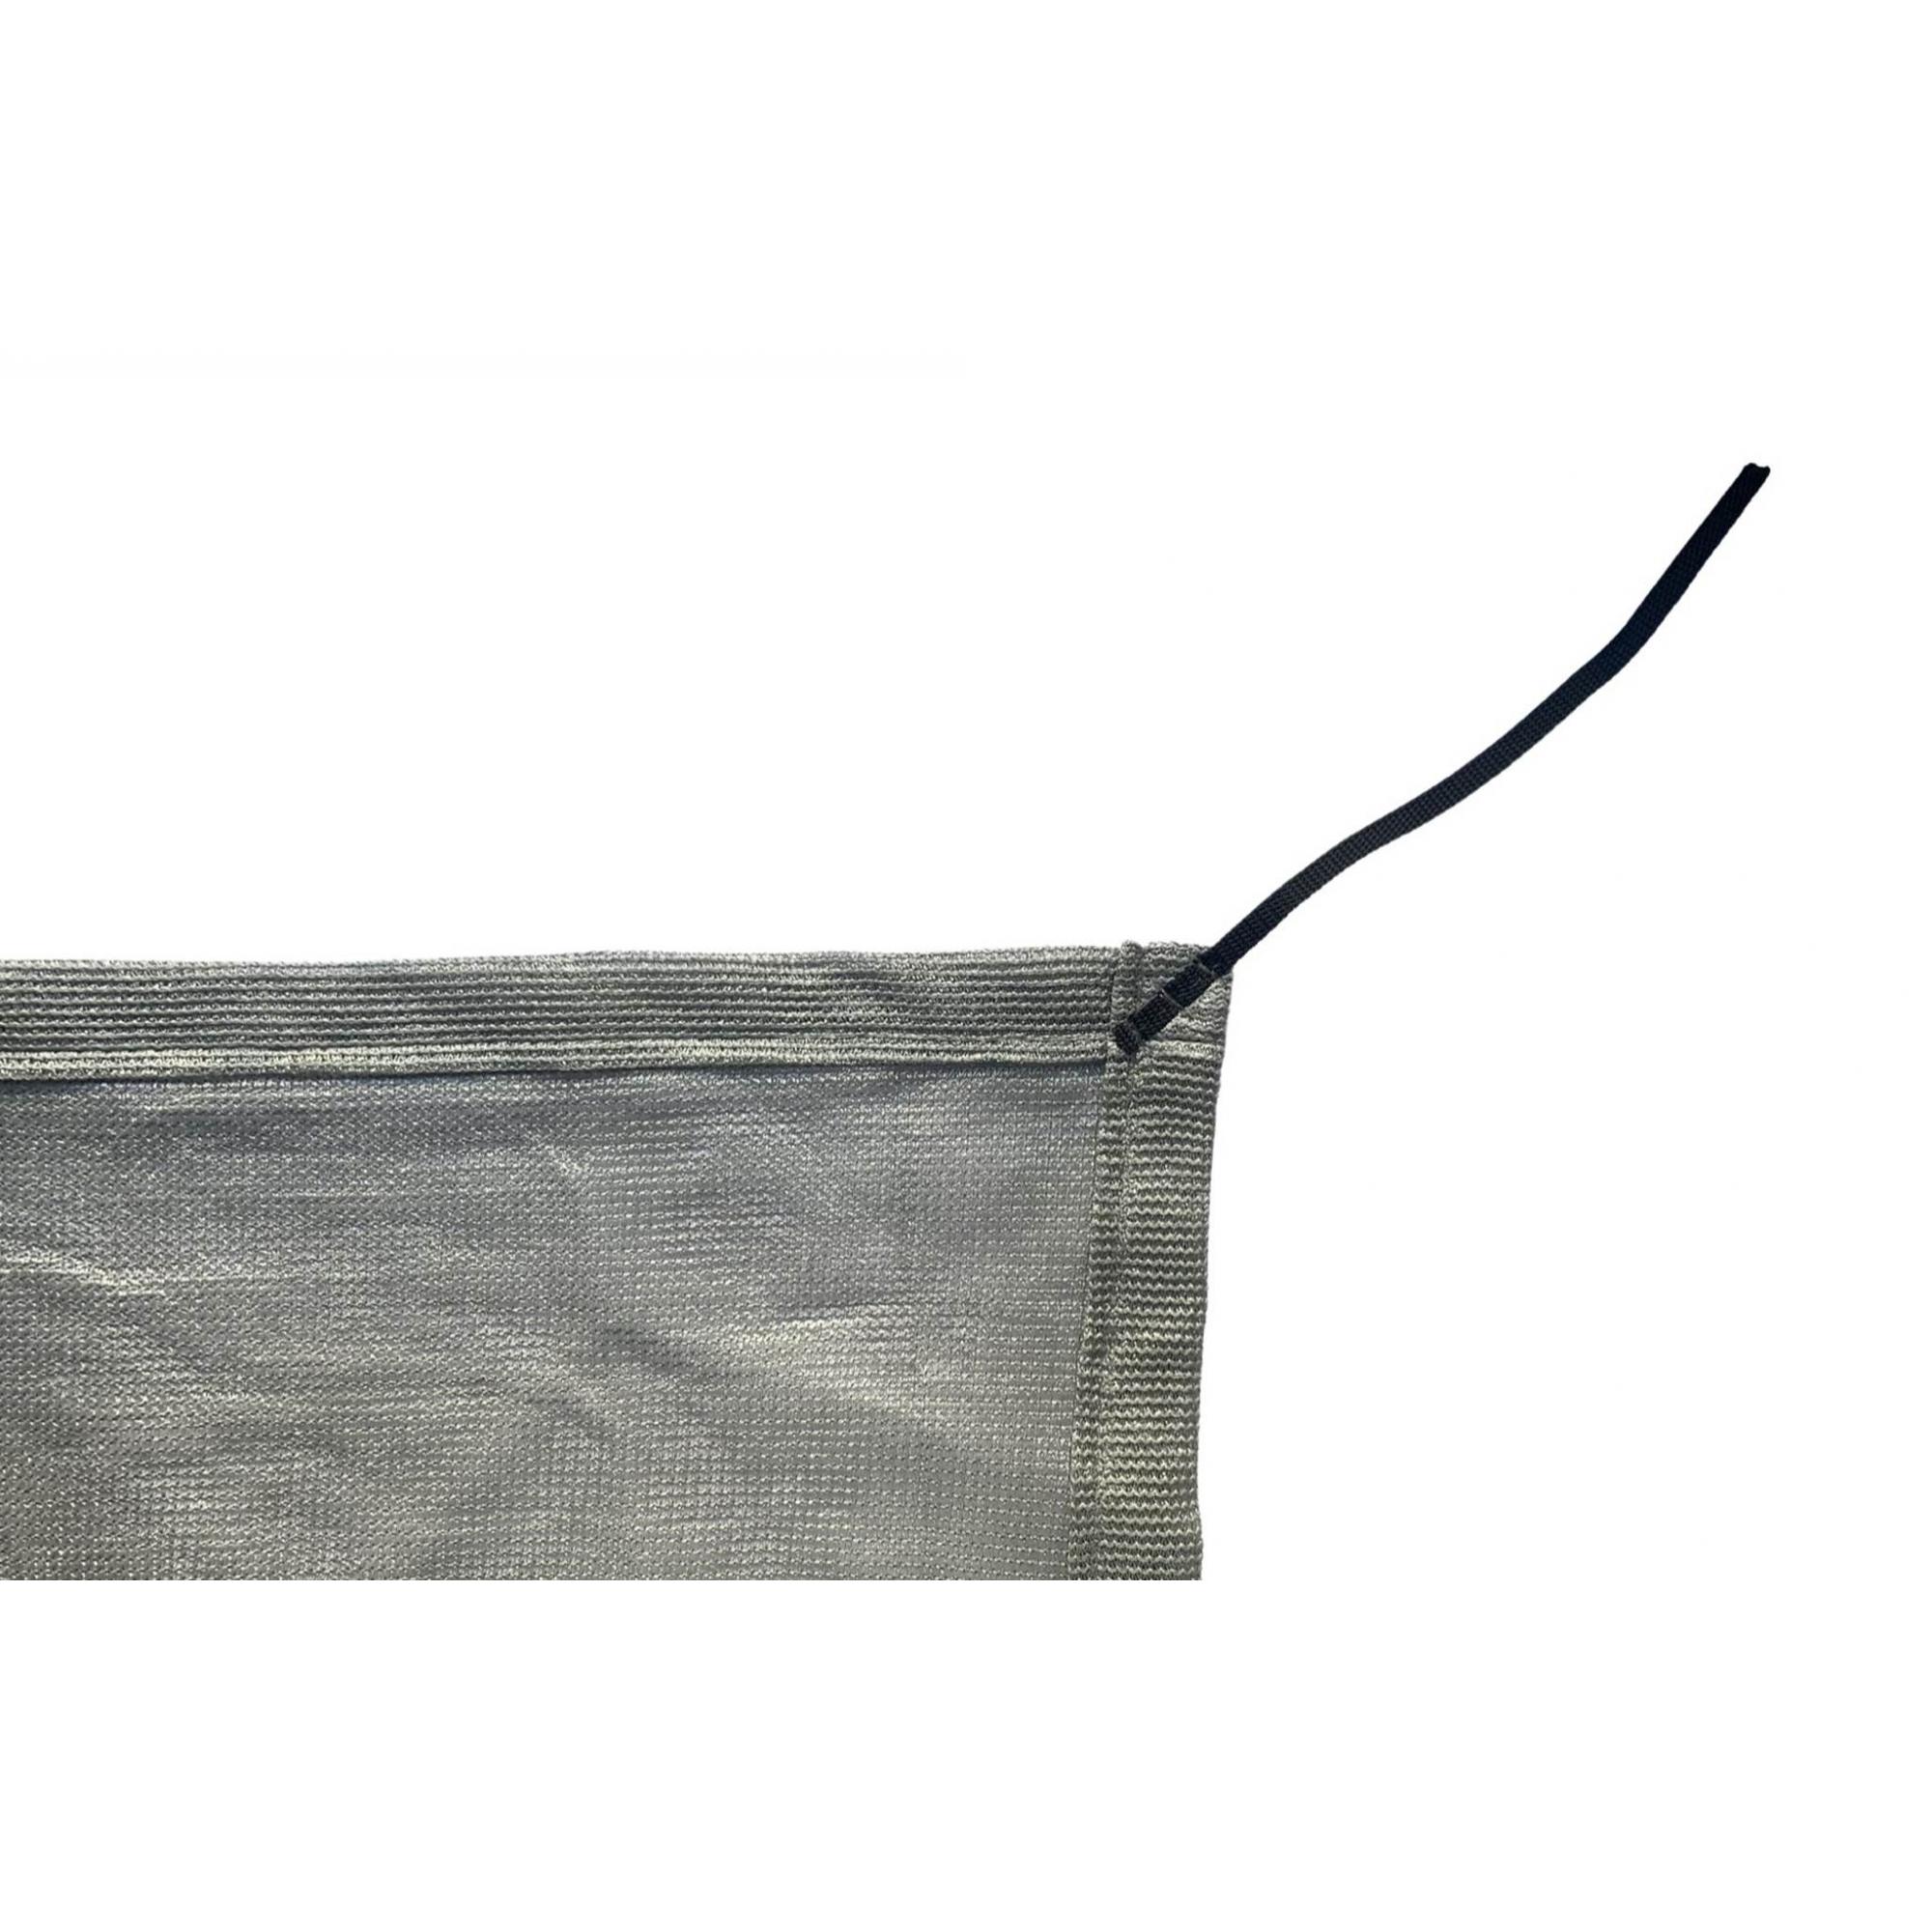 Tela de Sombreamento 80% Prata com Esticadores - Largura: 1 Metro